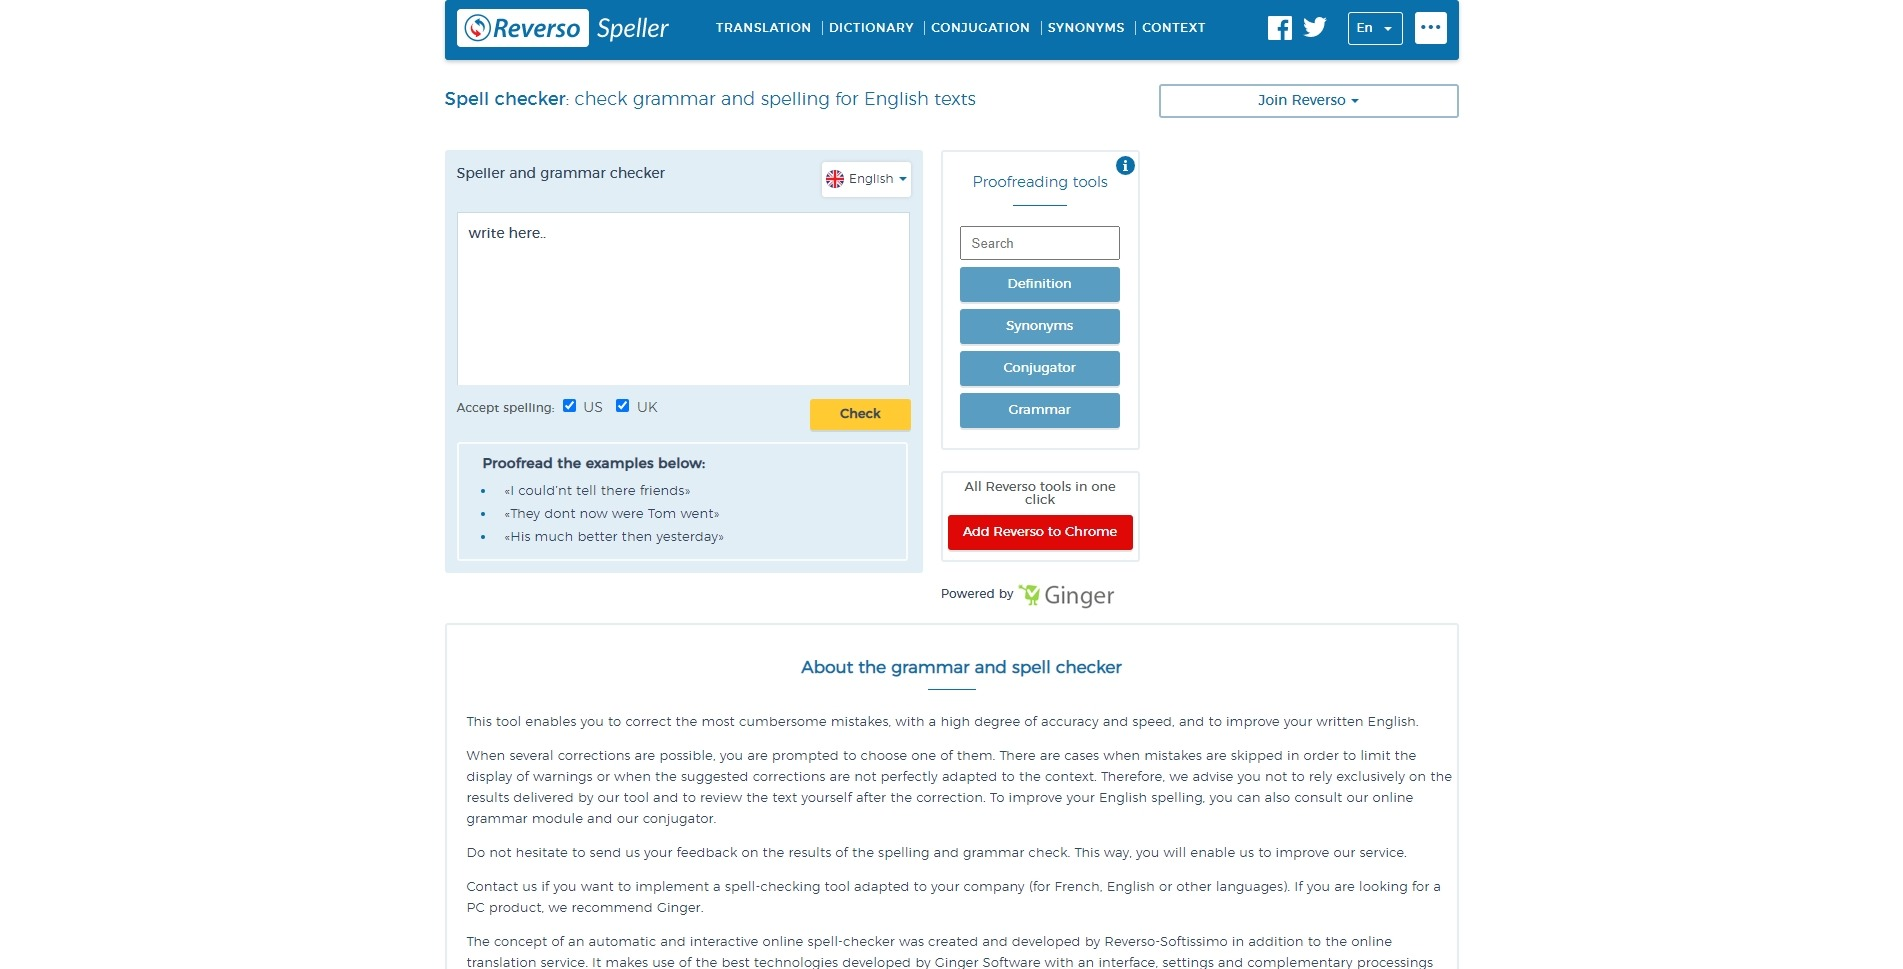 Проверка правописания онлайн: Reverso Speller